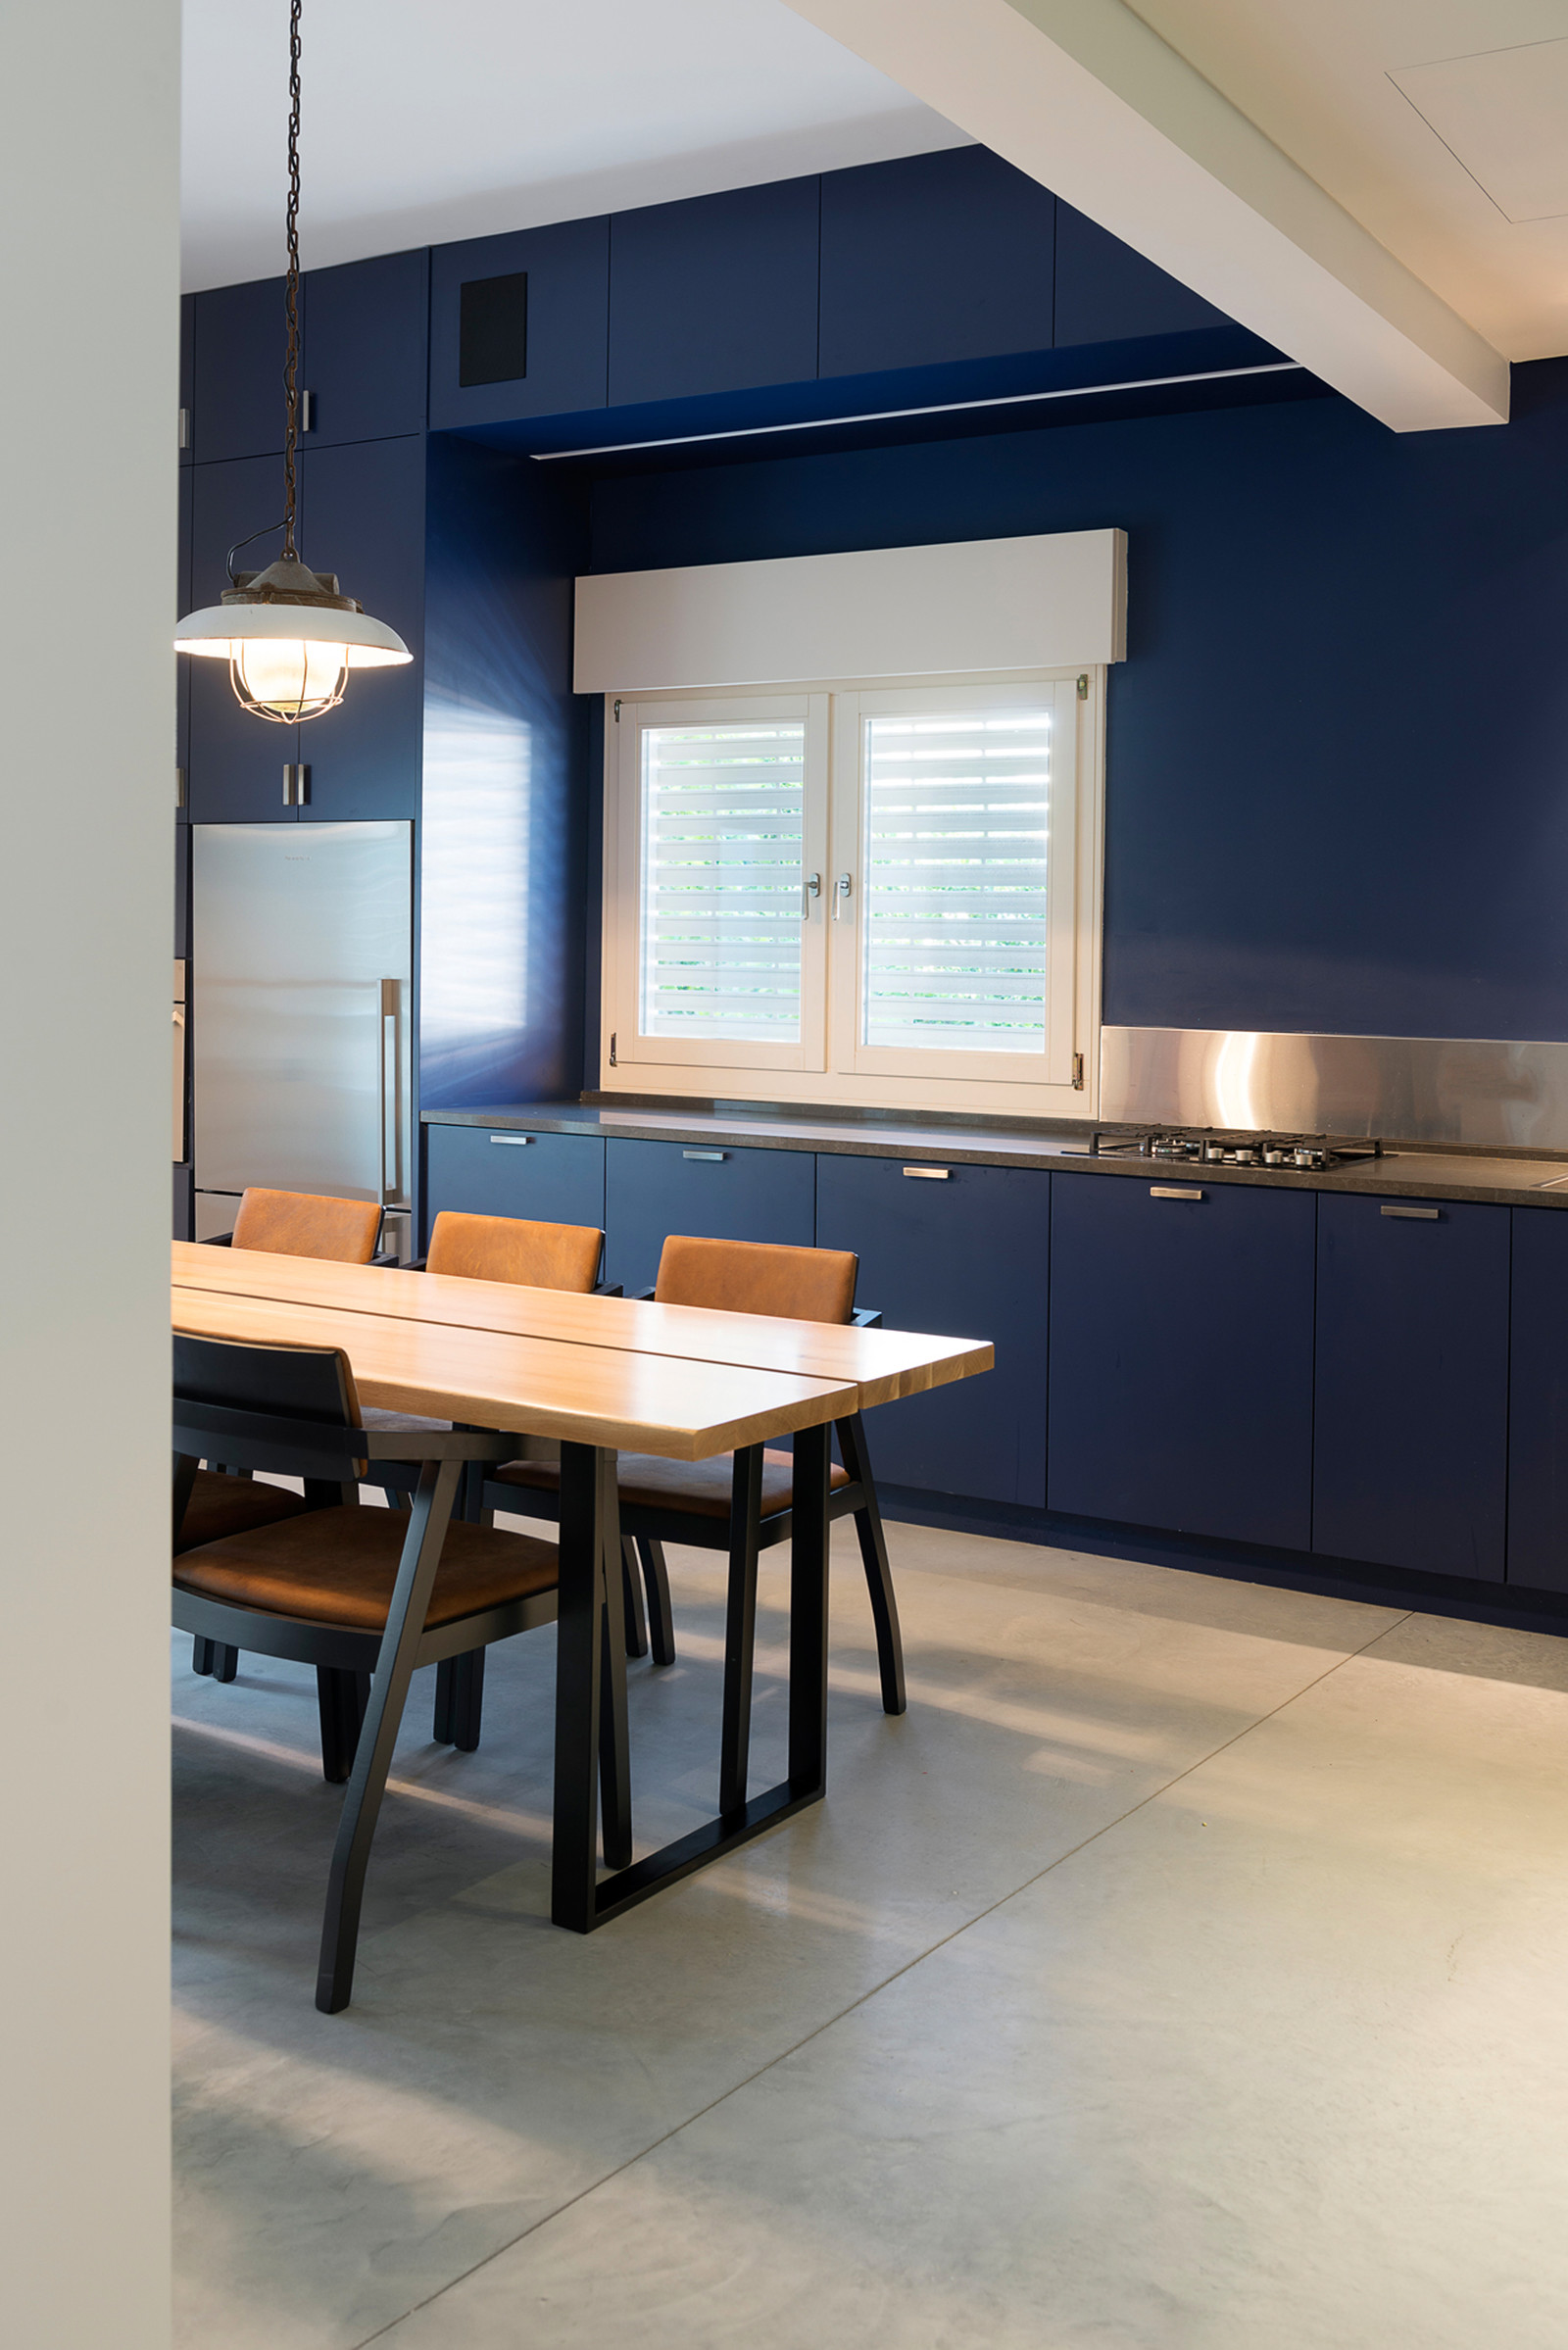 Apartment-renovation-just3ds.com-7